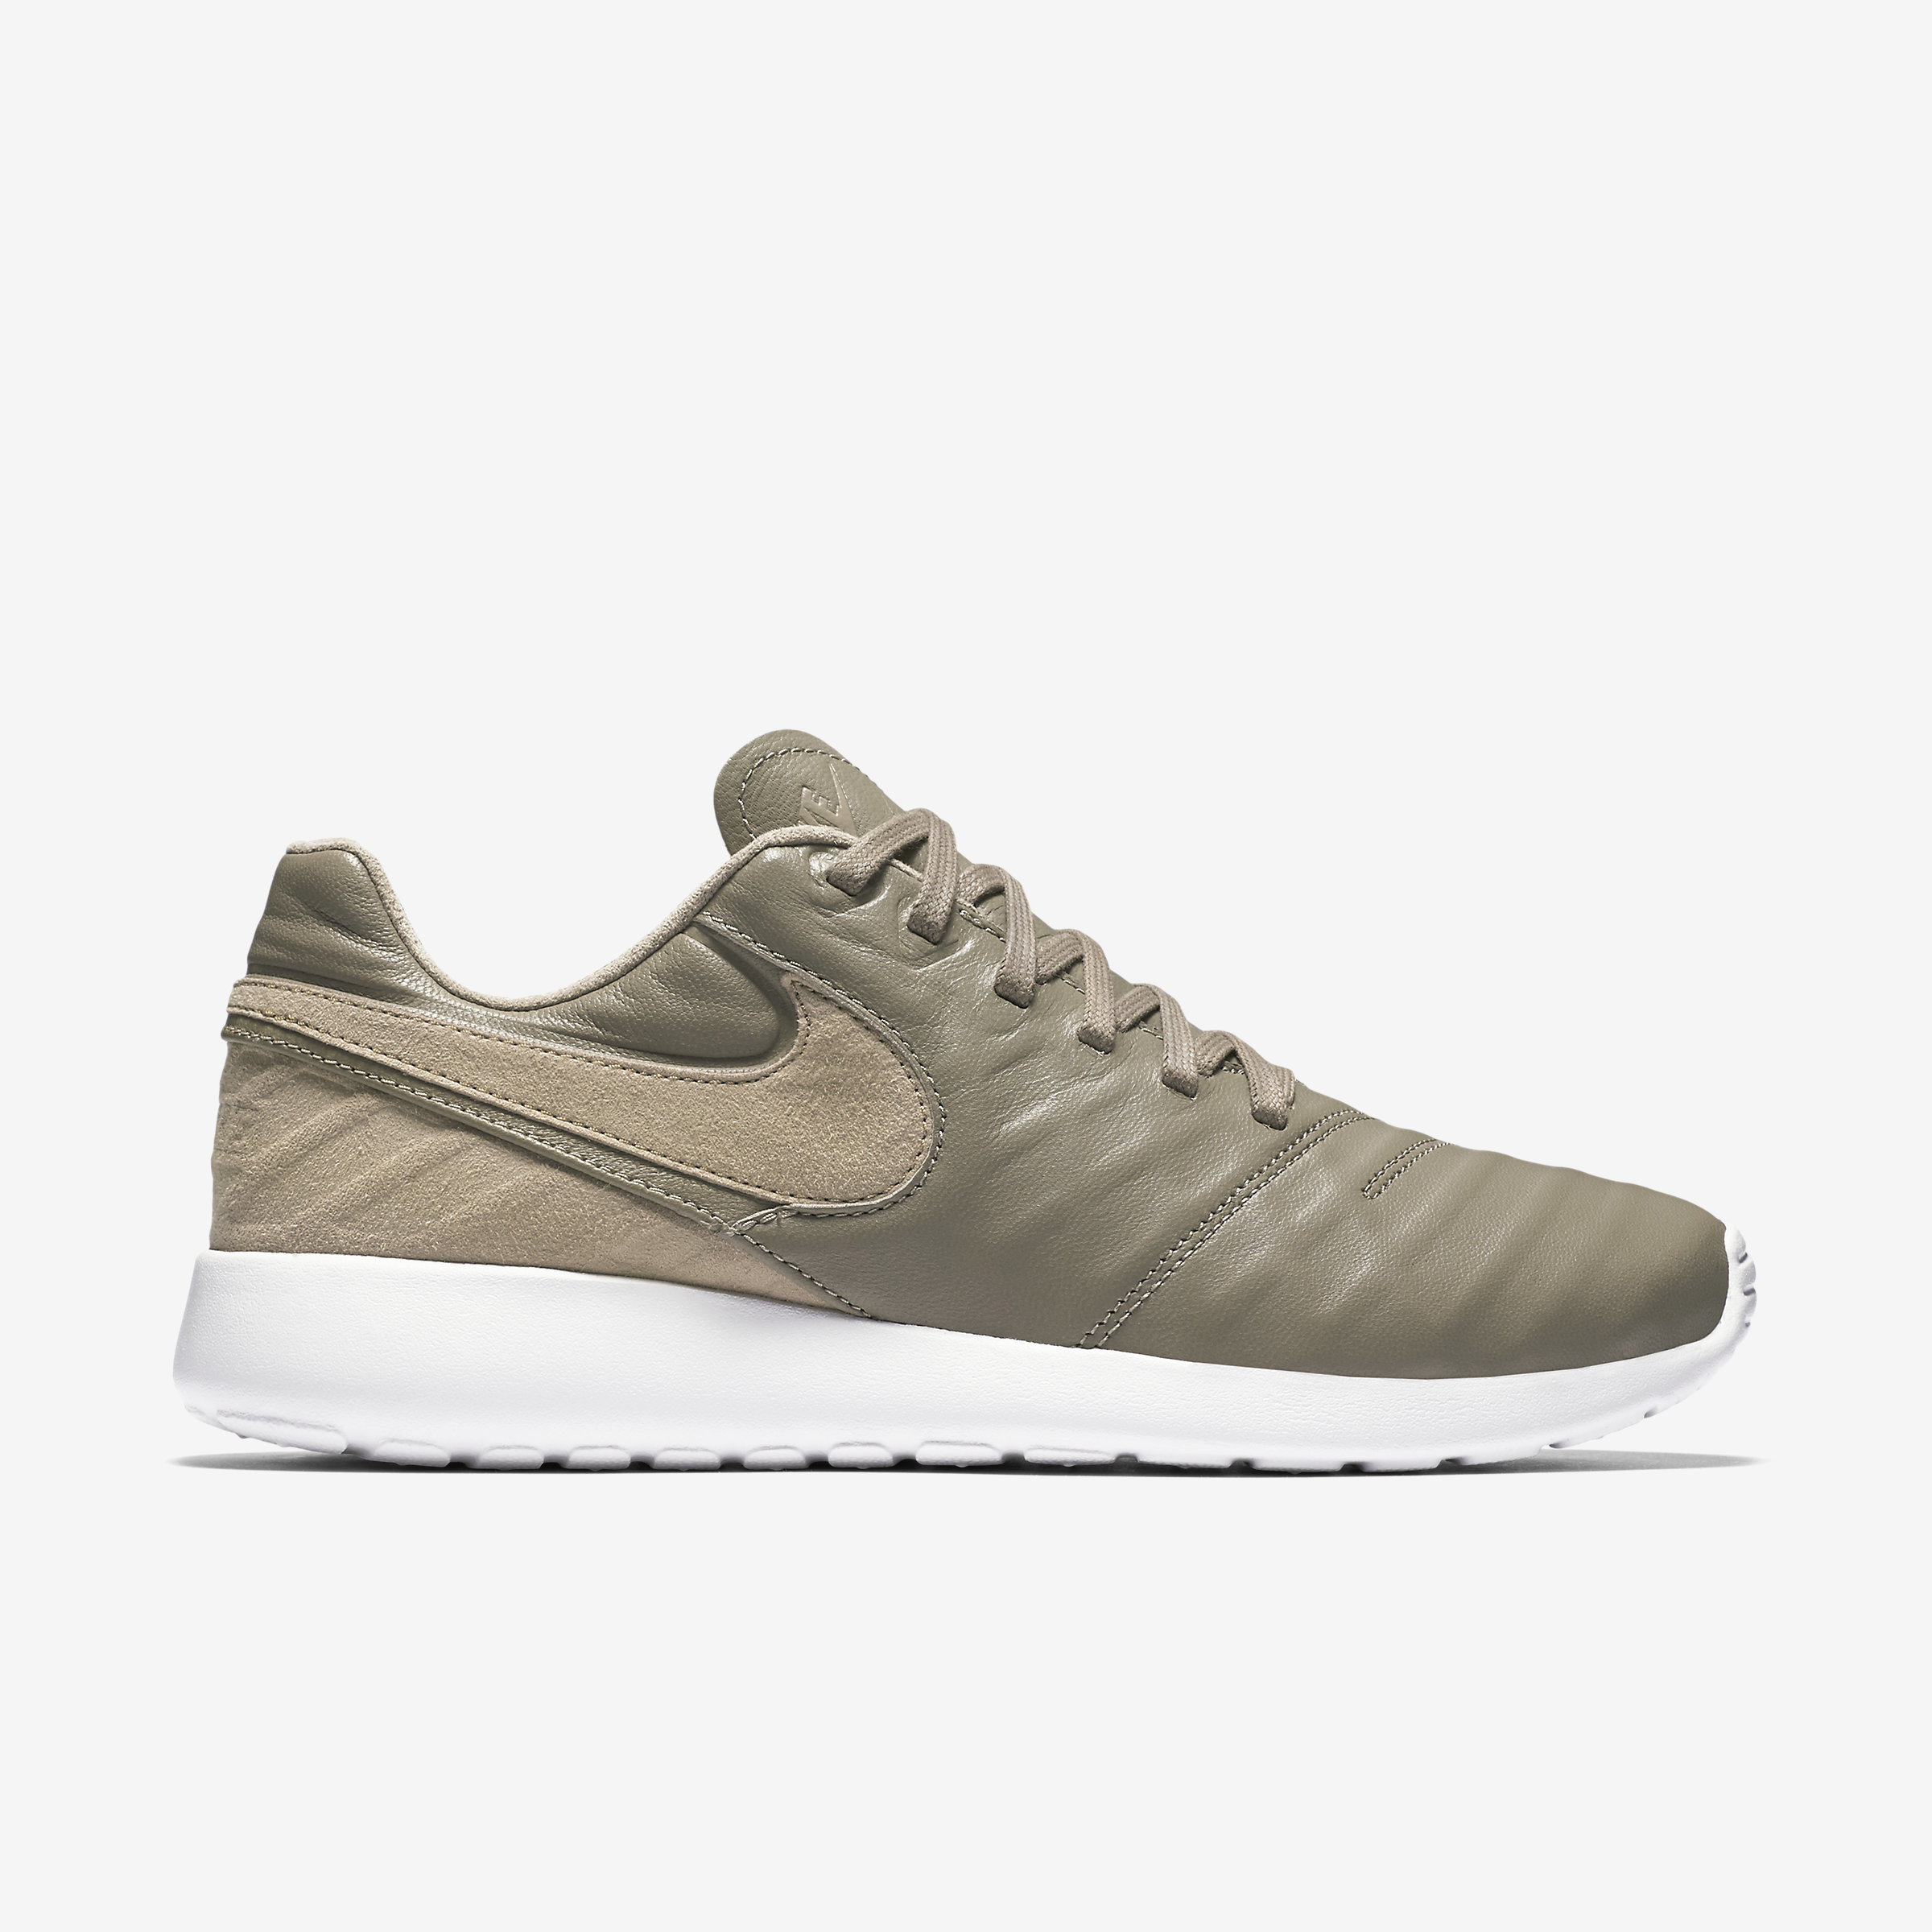 Nike Leather Roshe Tiempo Vi Qs in Metallic for Men